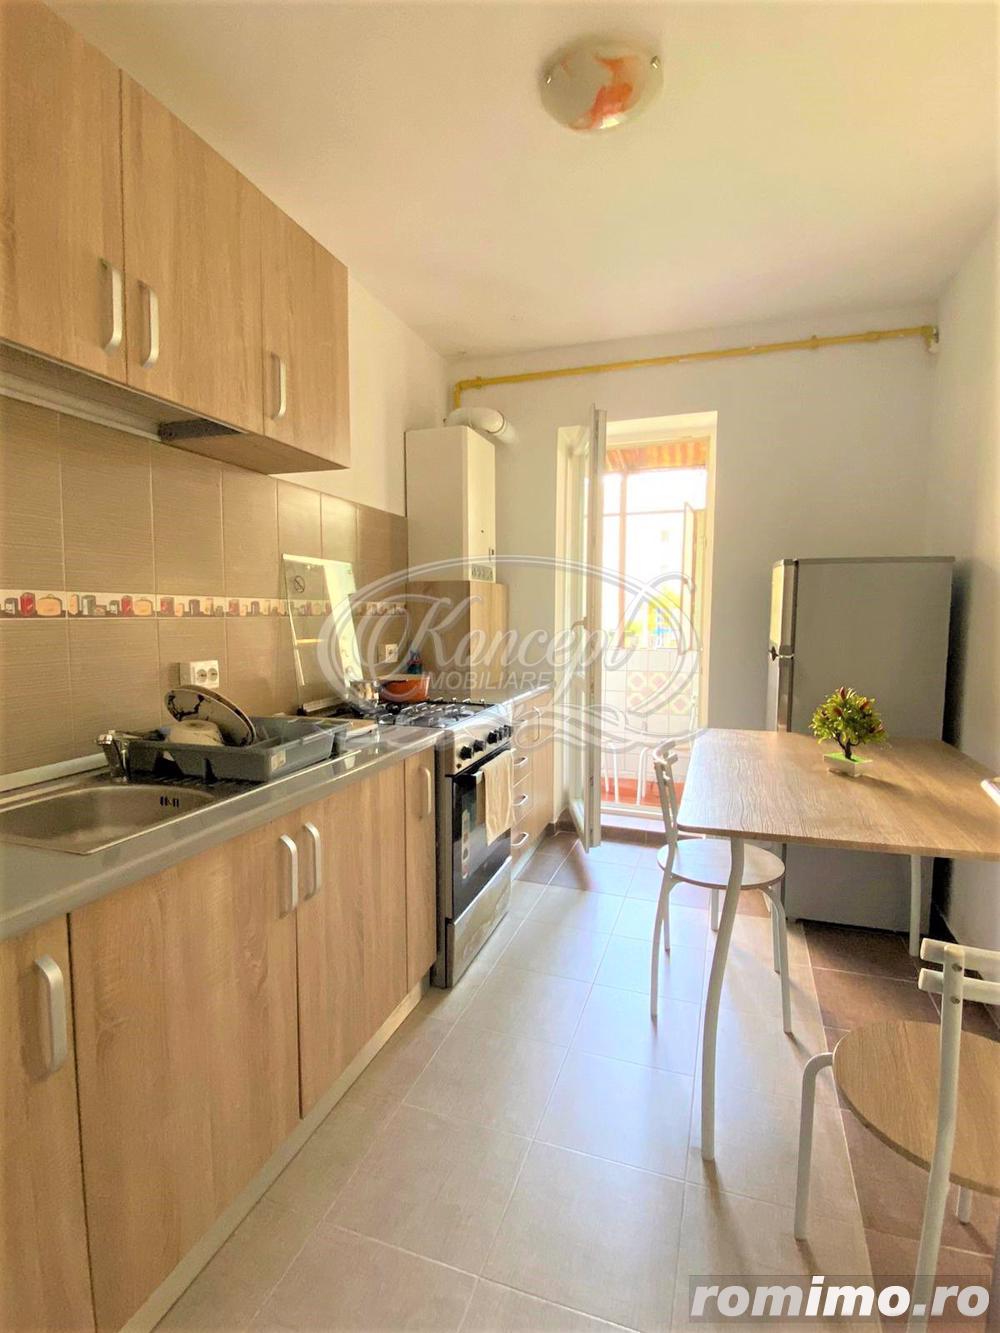 Apartament mobilat, utilat, cartier Manastur, zona BIG